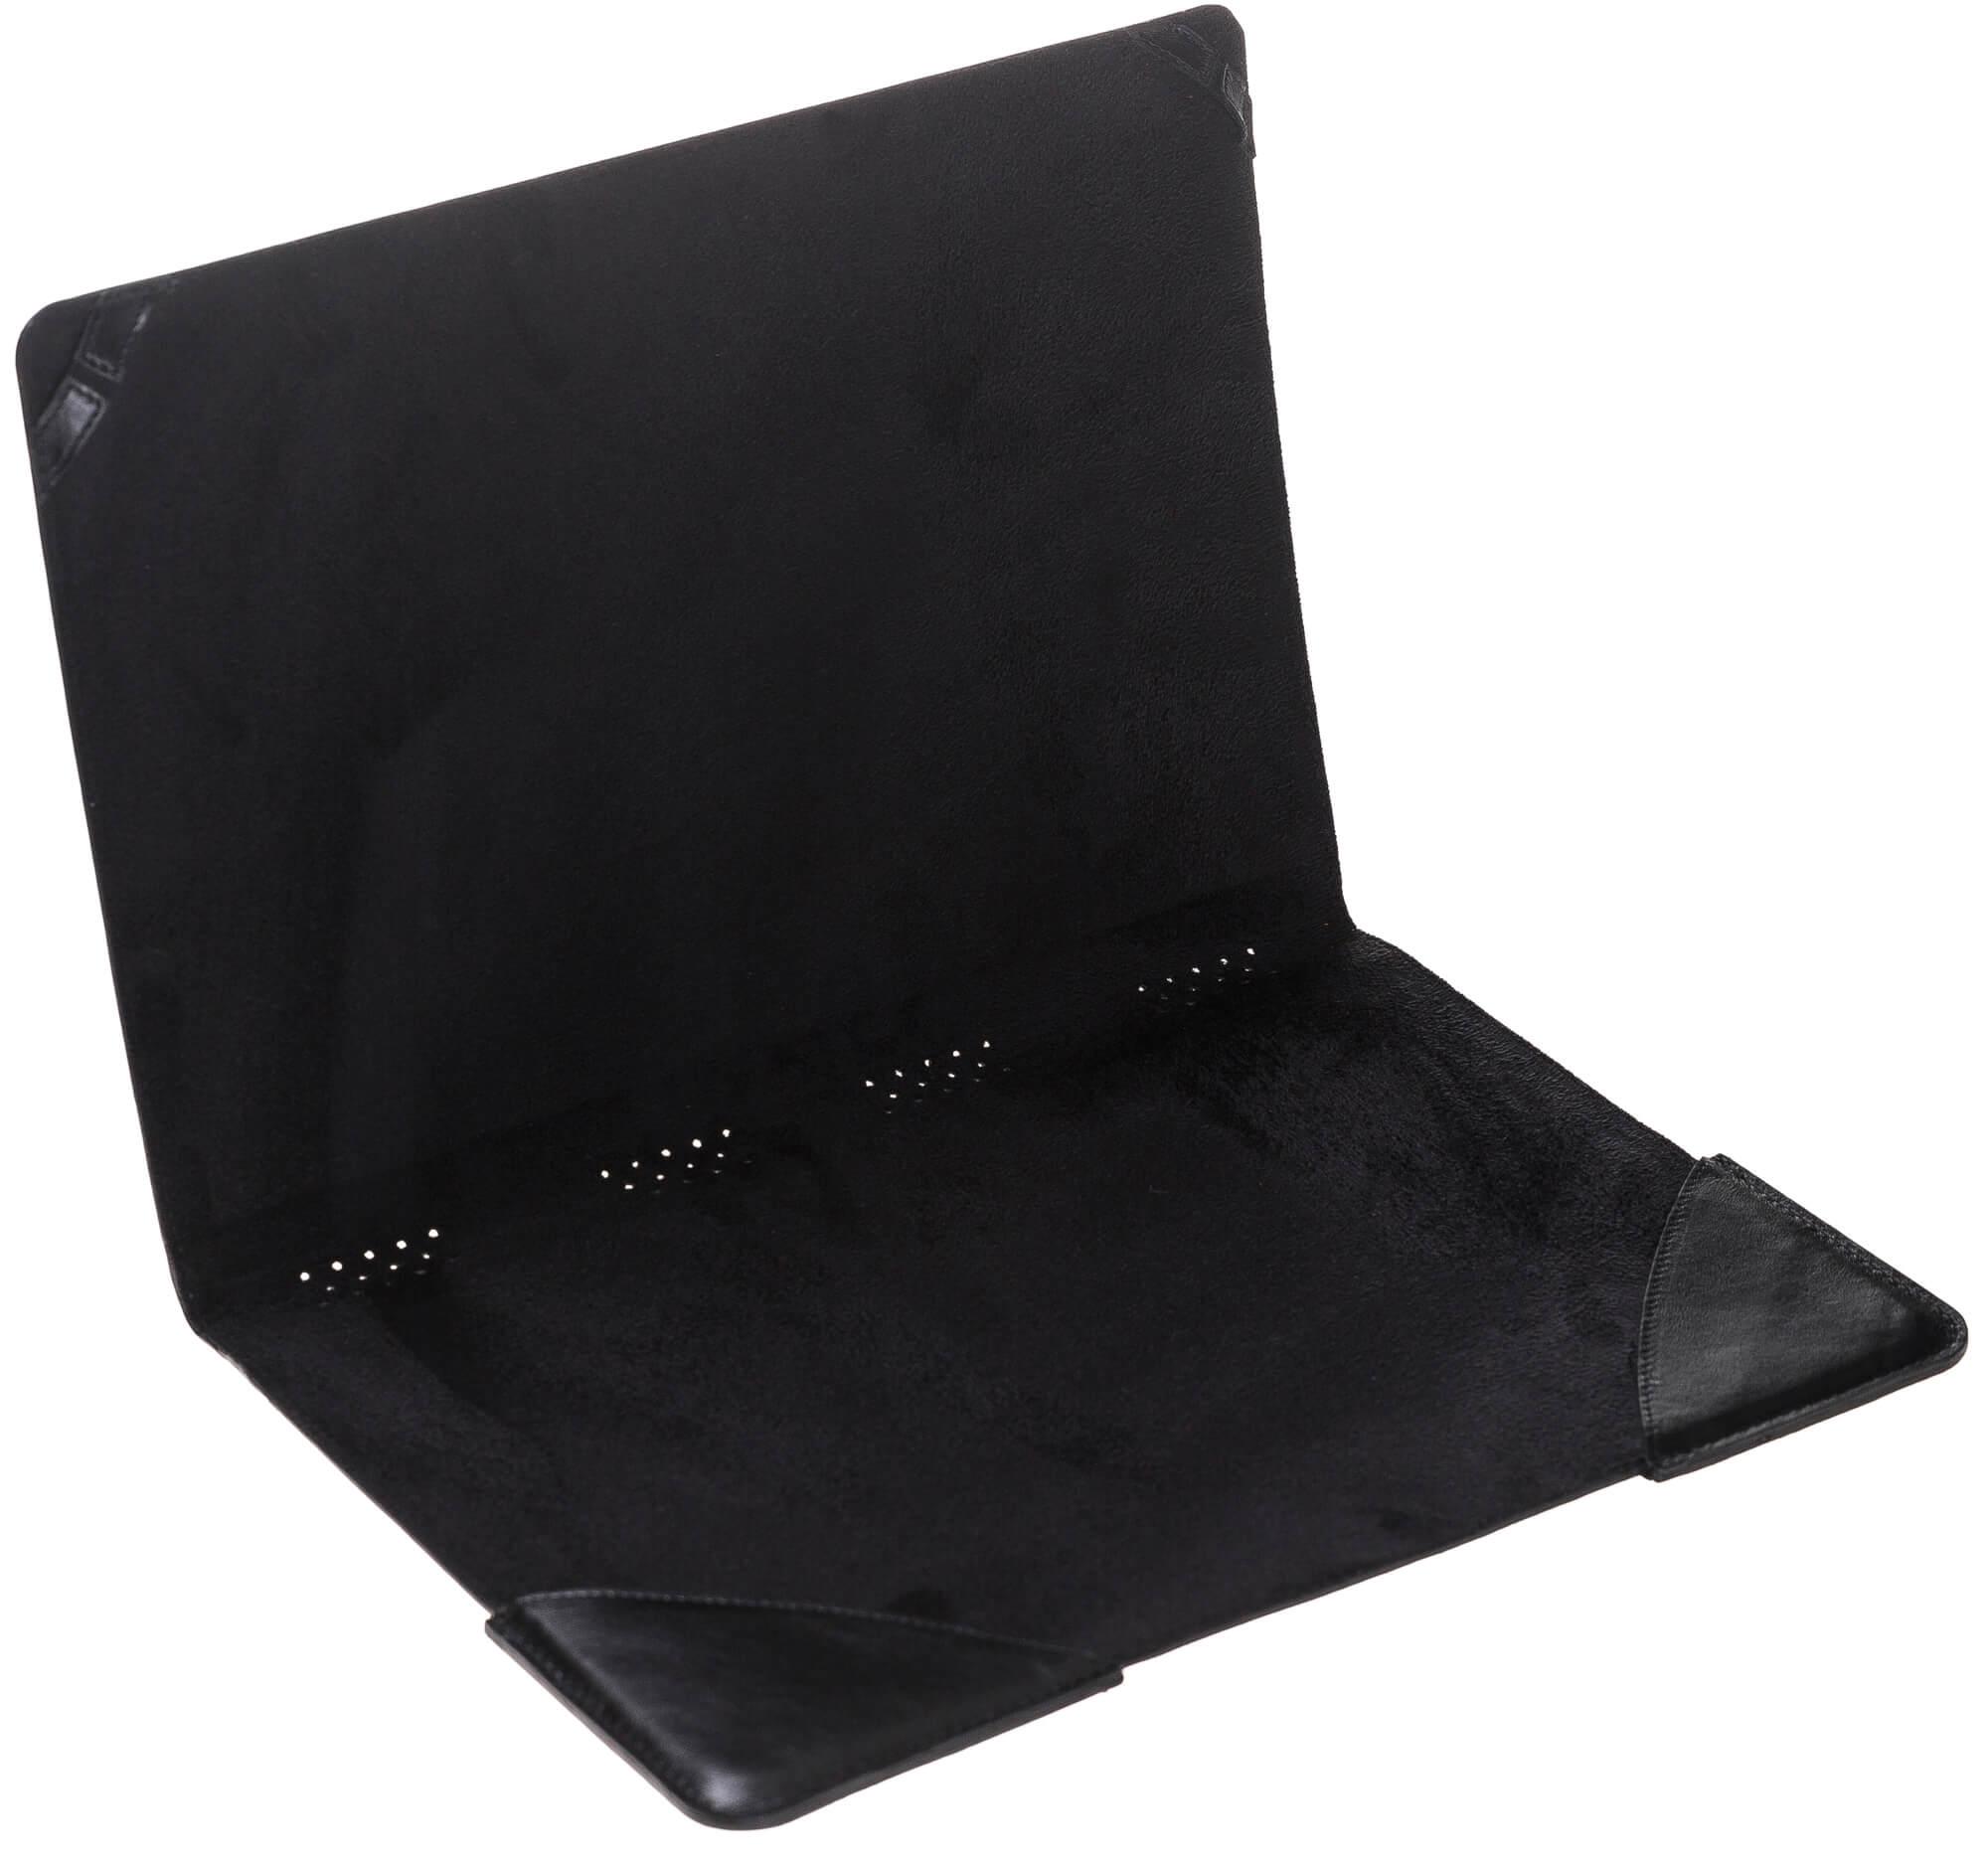 "MacBook Pro 13 Zoll ""Münich"" Schwarz"